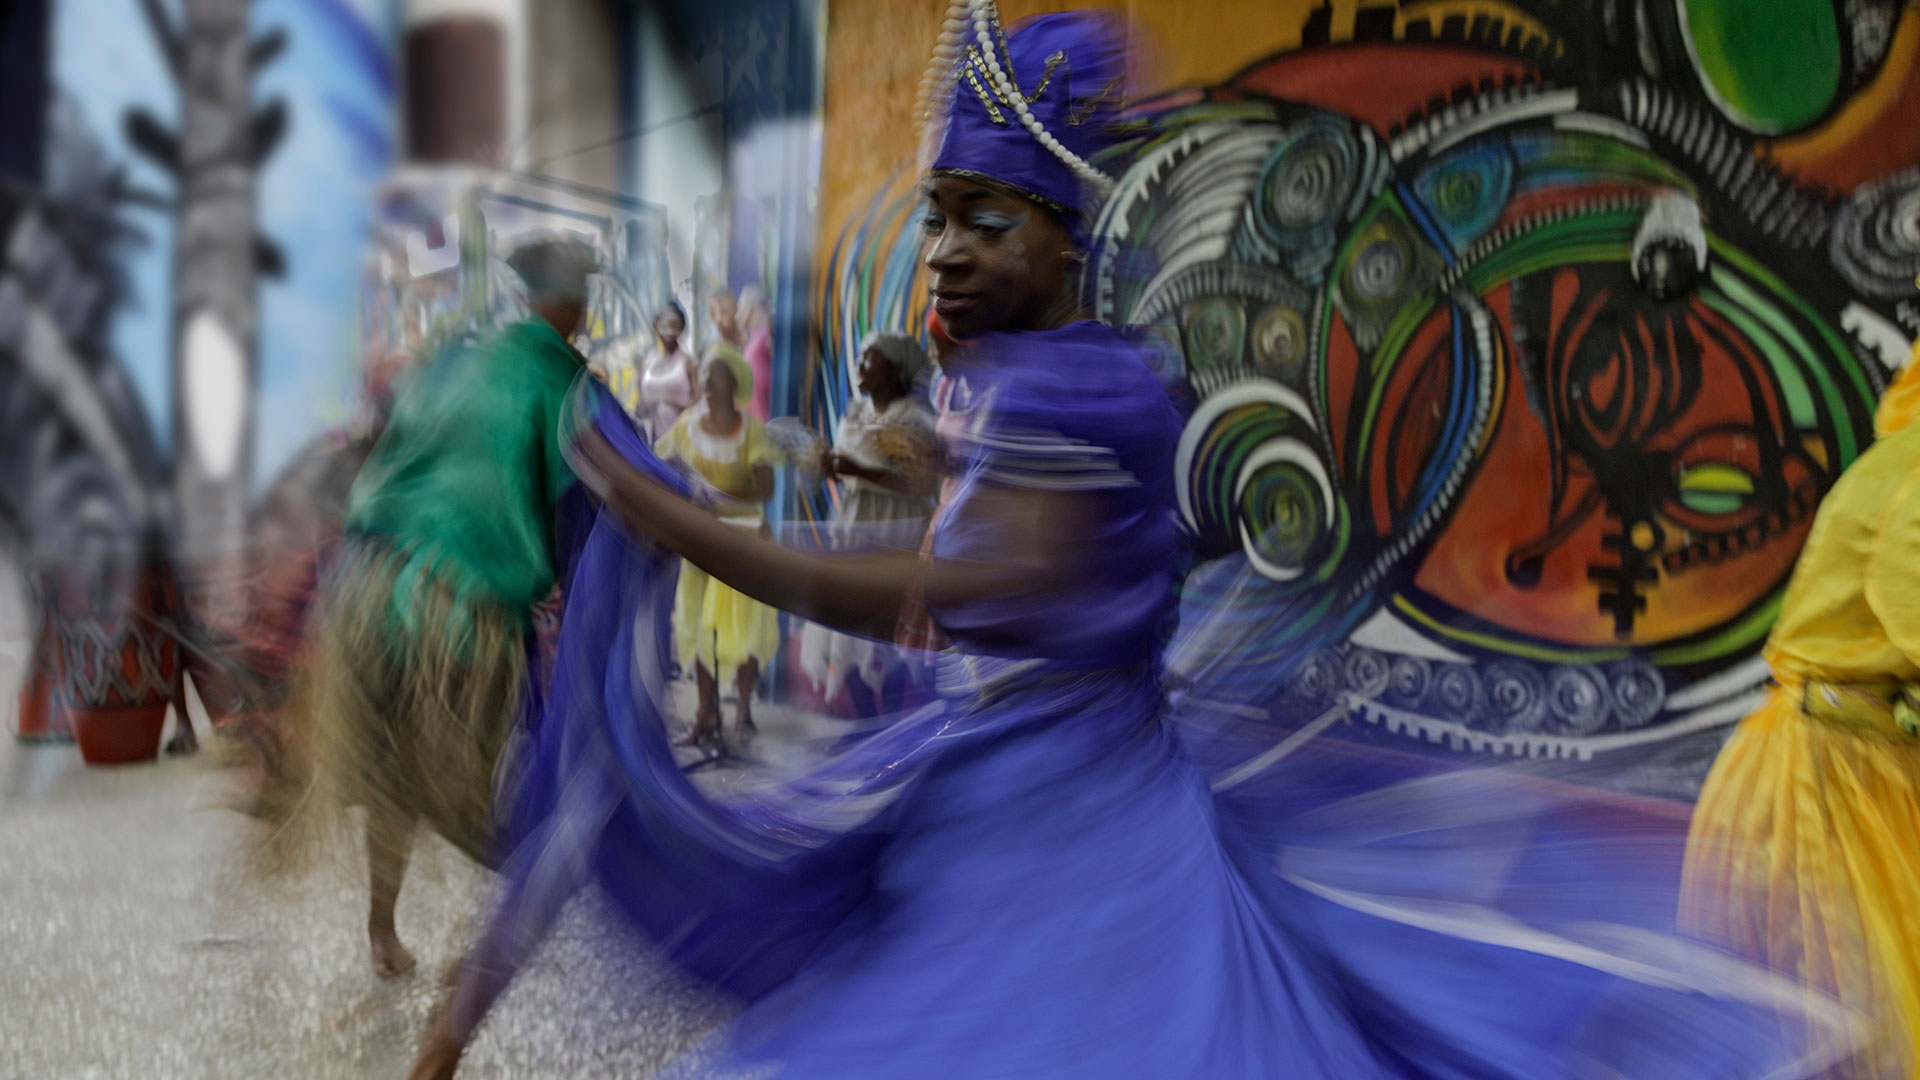 Cuban dancer in motion, Callejon de Hamel, Cuba